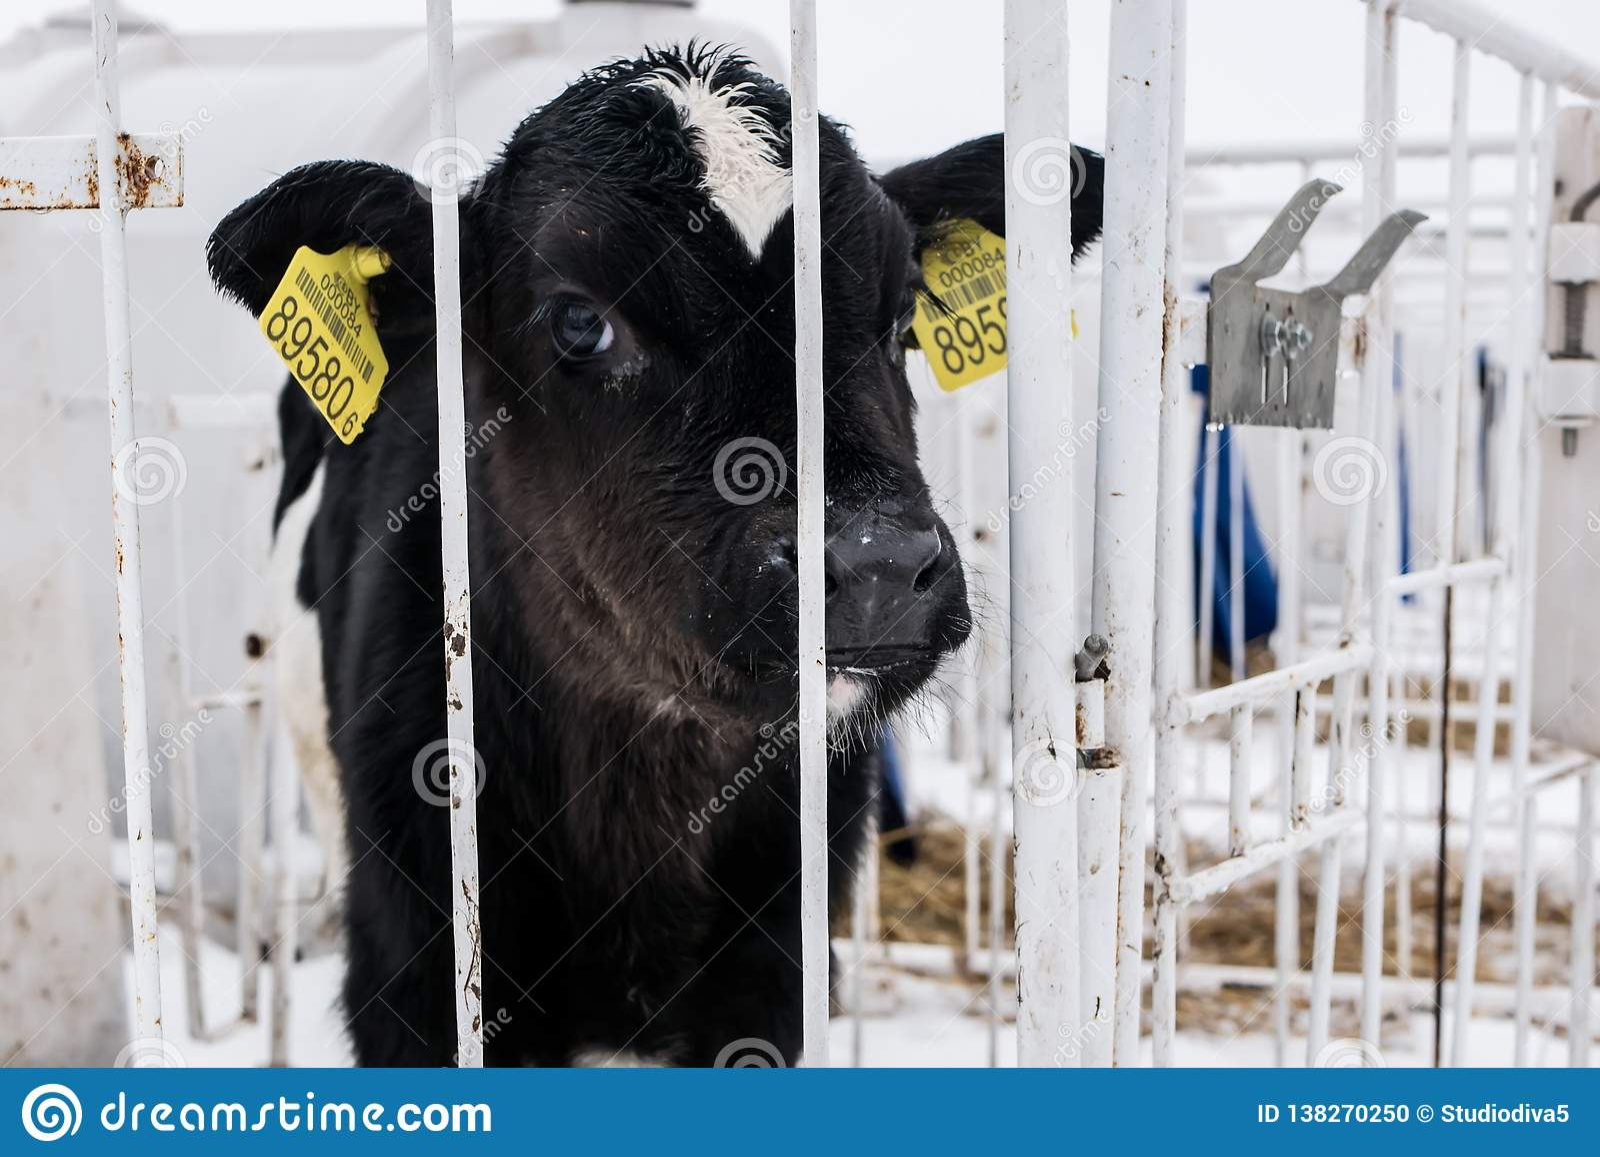 Poco becerro en una granja lechera farming